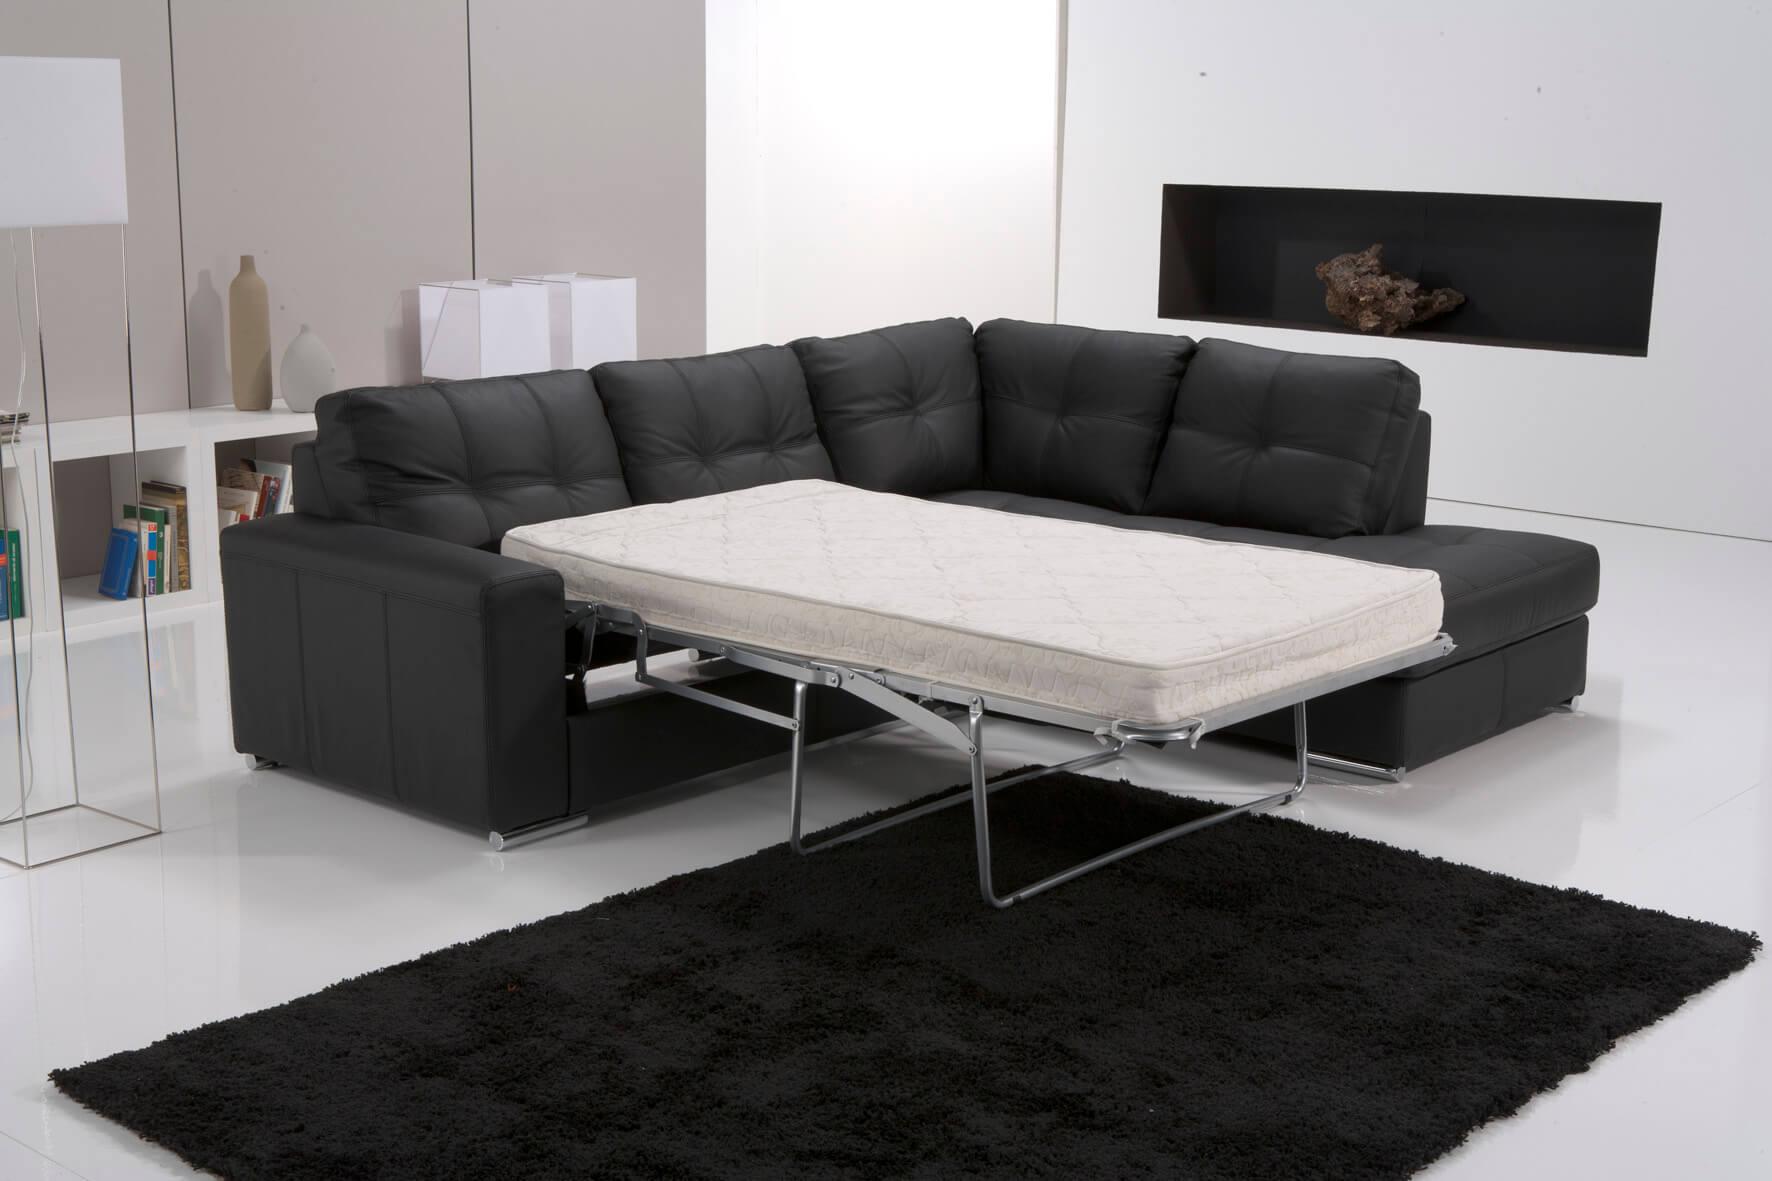 ALEXIE sofa giotto living sofa relax sofa ange sofa sofabed